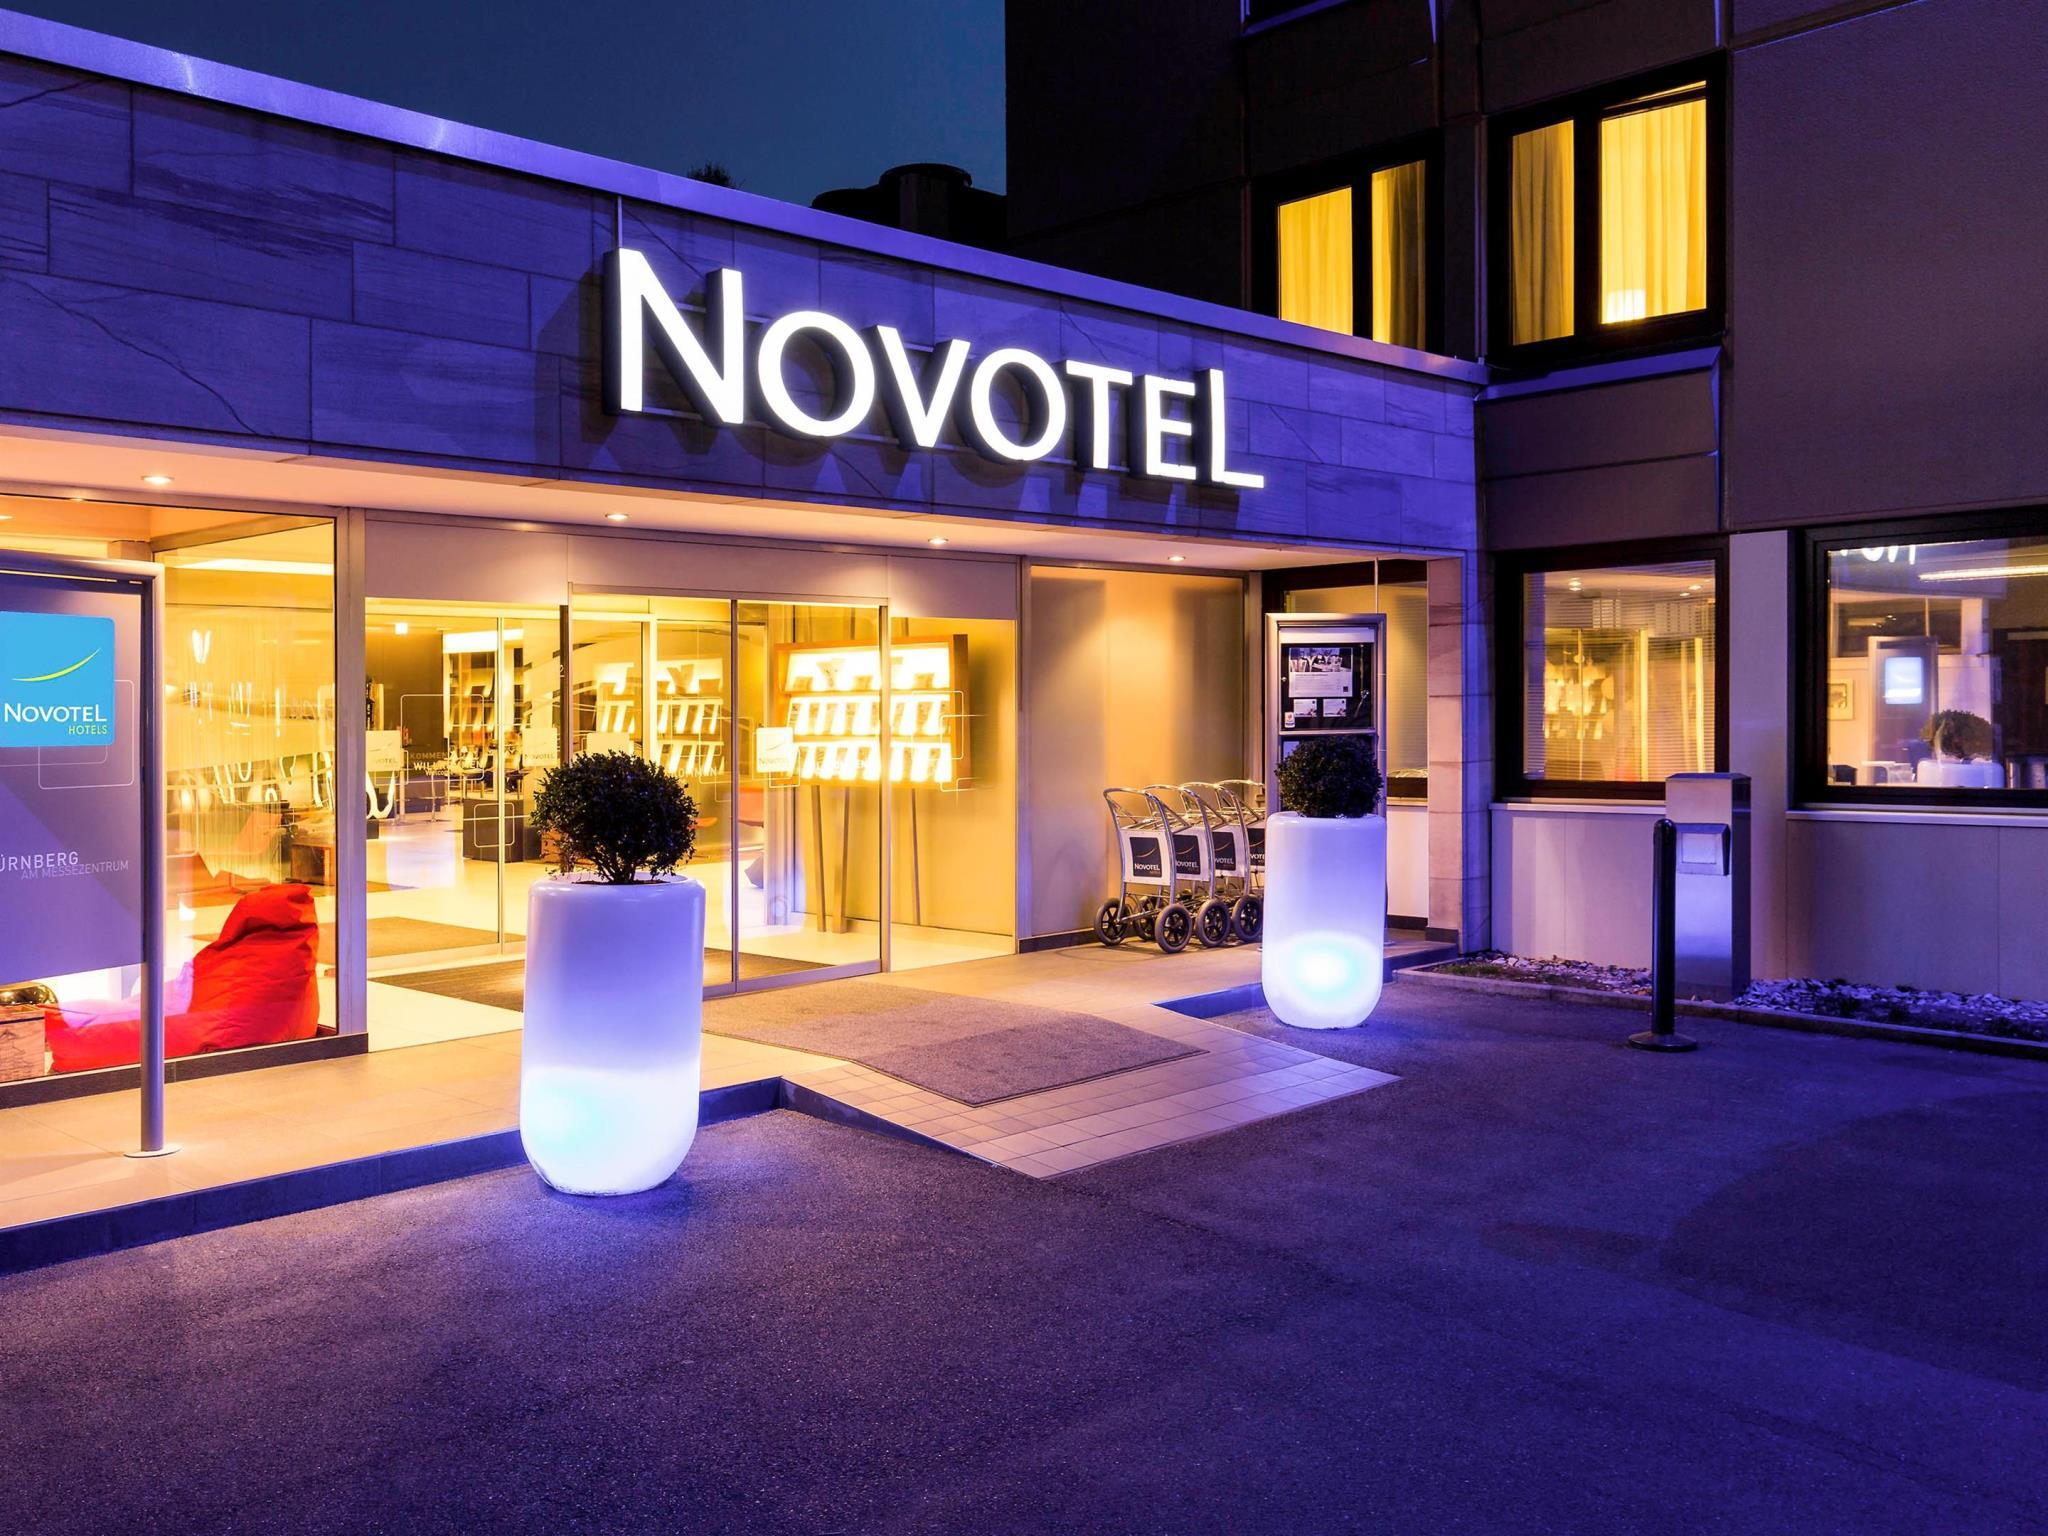 Novotel Nurnberg Am Messezentrum Hotel, Nürnberg